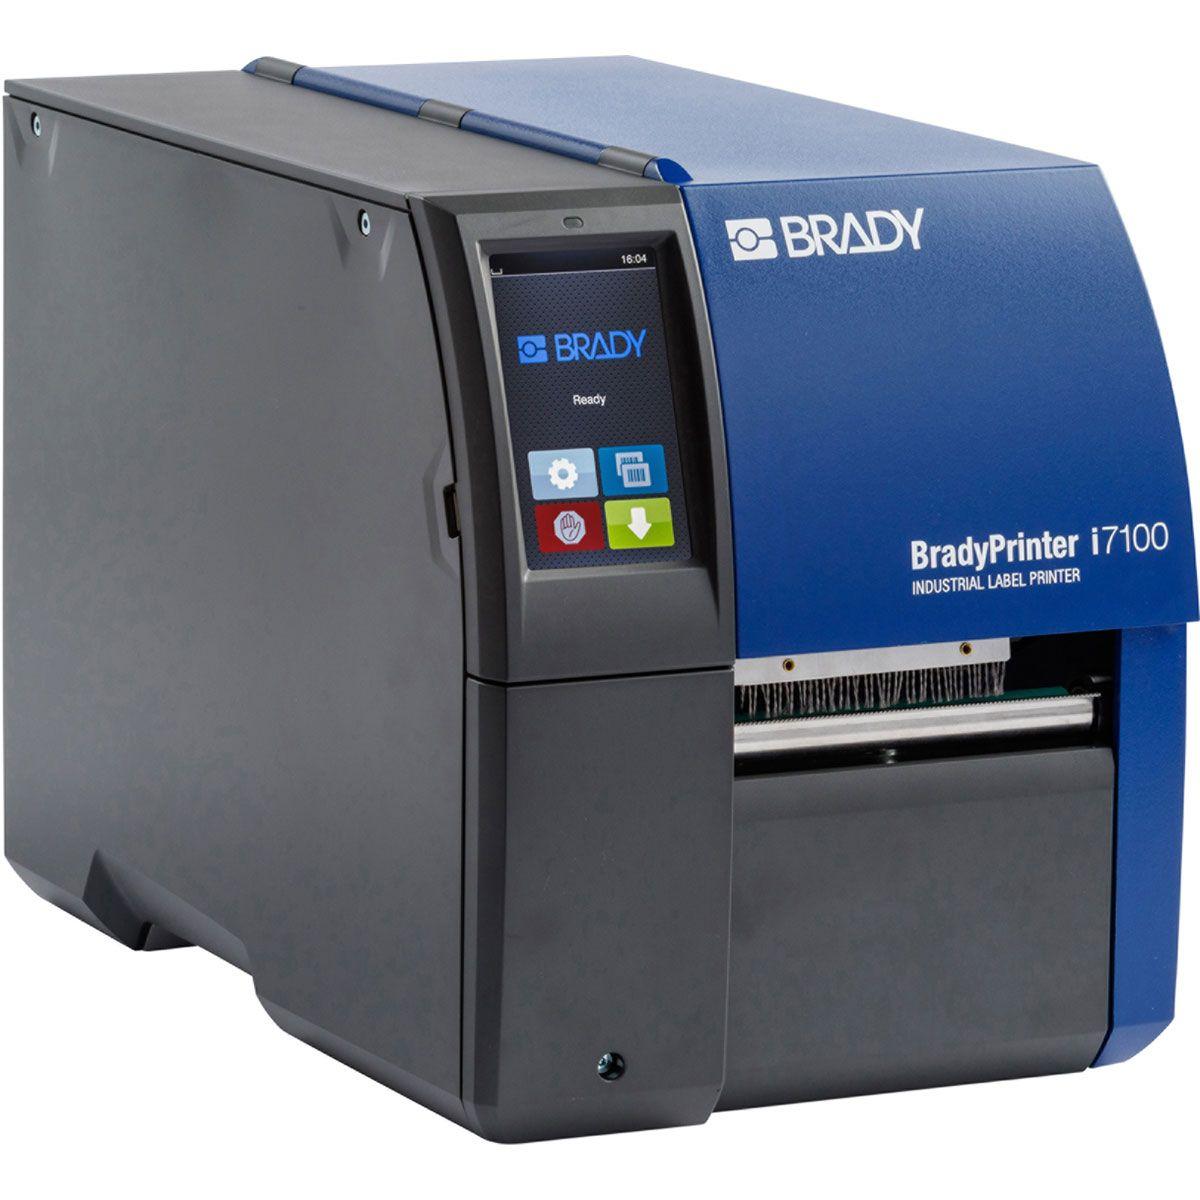 BradyPrinter i7100 300dpi Industrial Label Printer